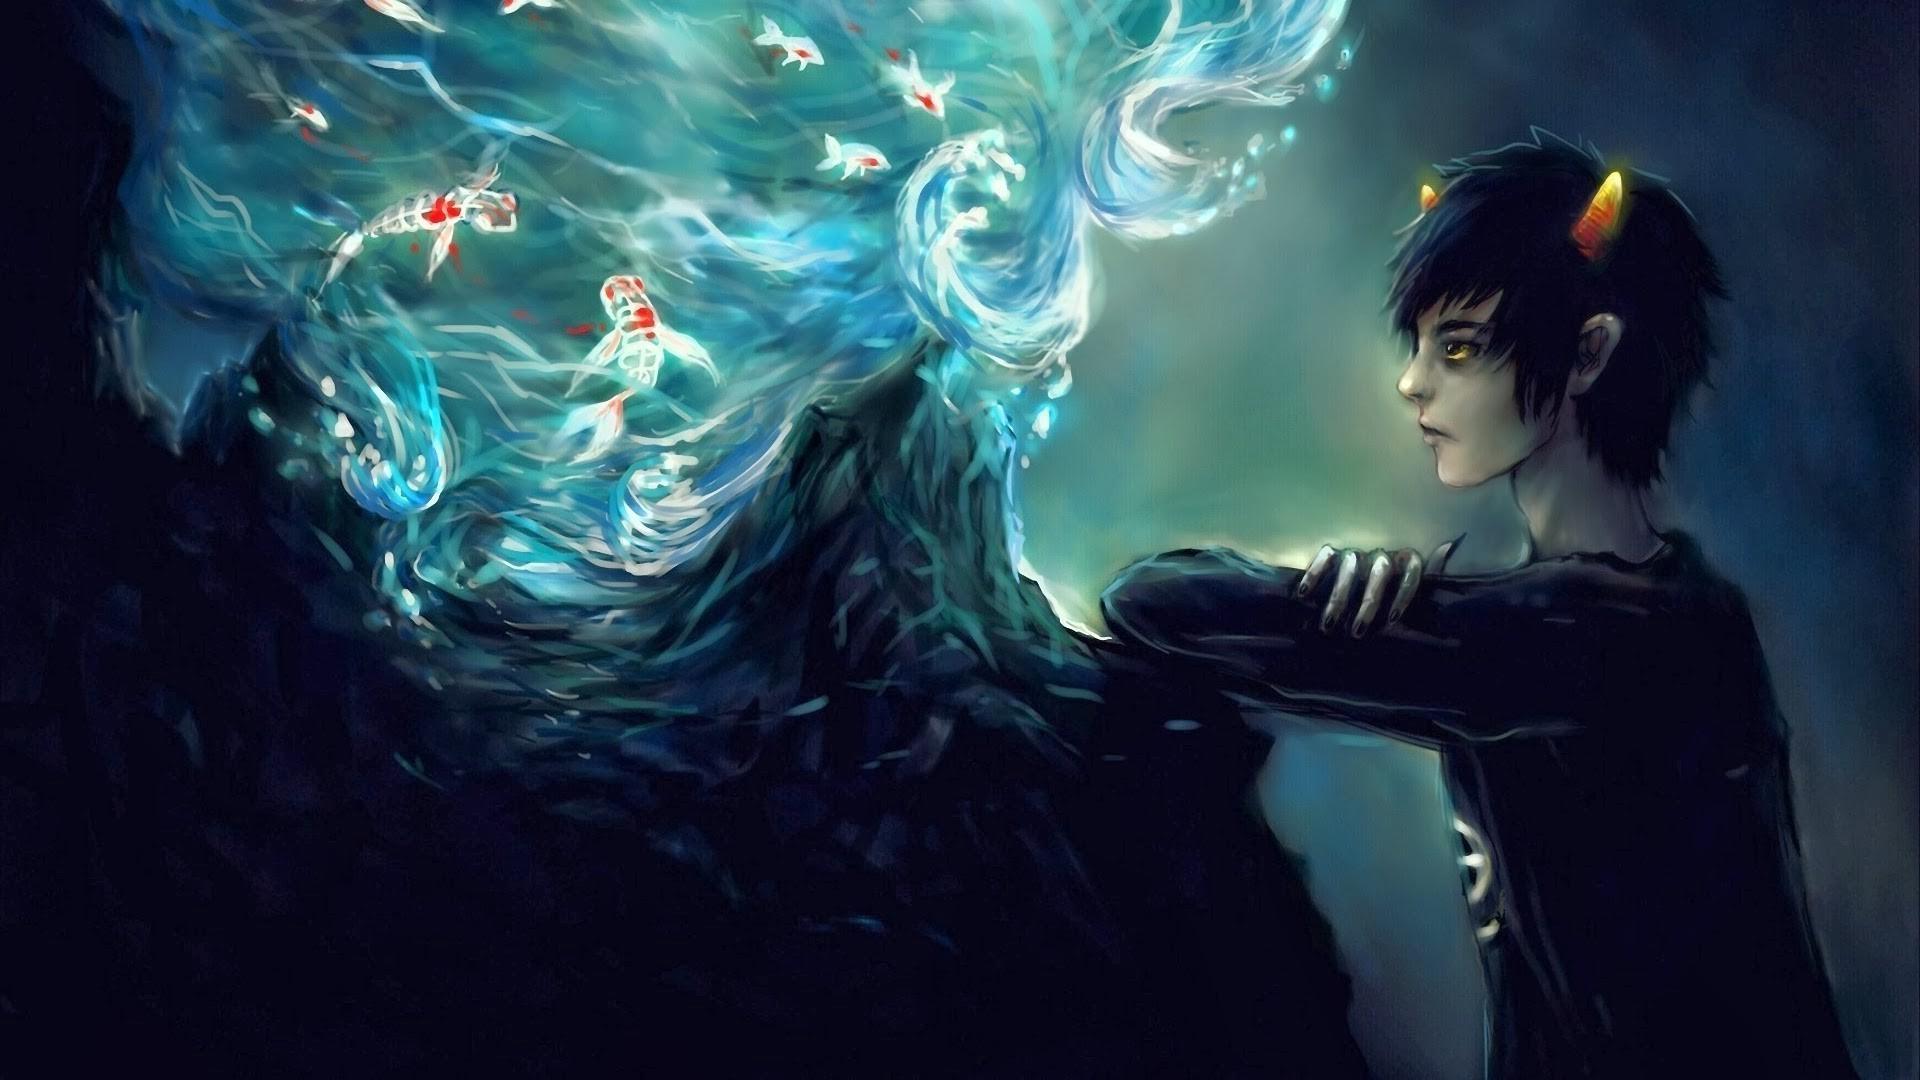 Homestuck, Water, Fantasy Art Wallpapers HD / Desktop and Mobile Backgrounds